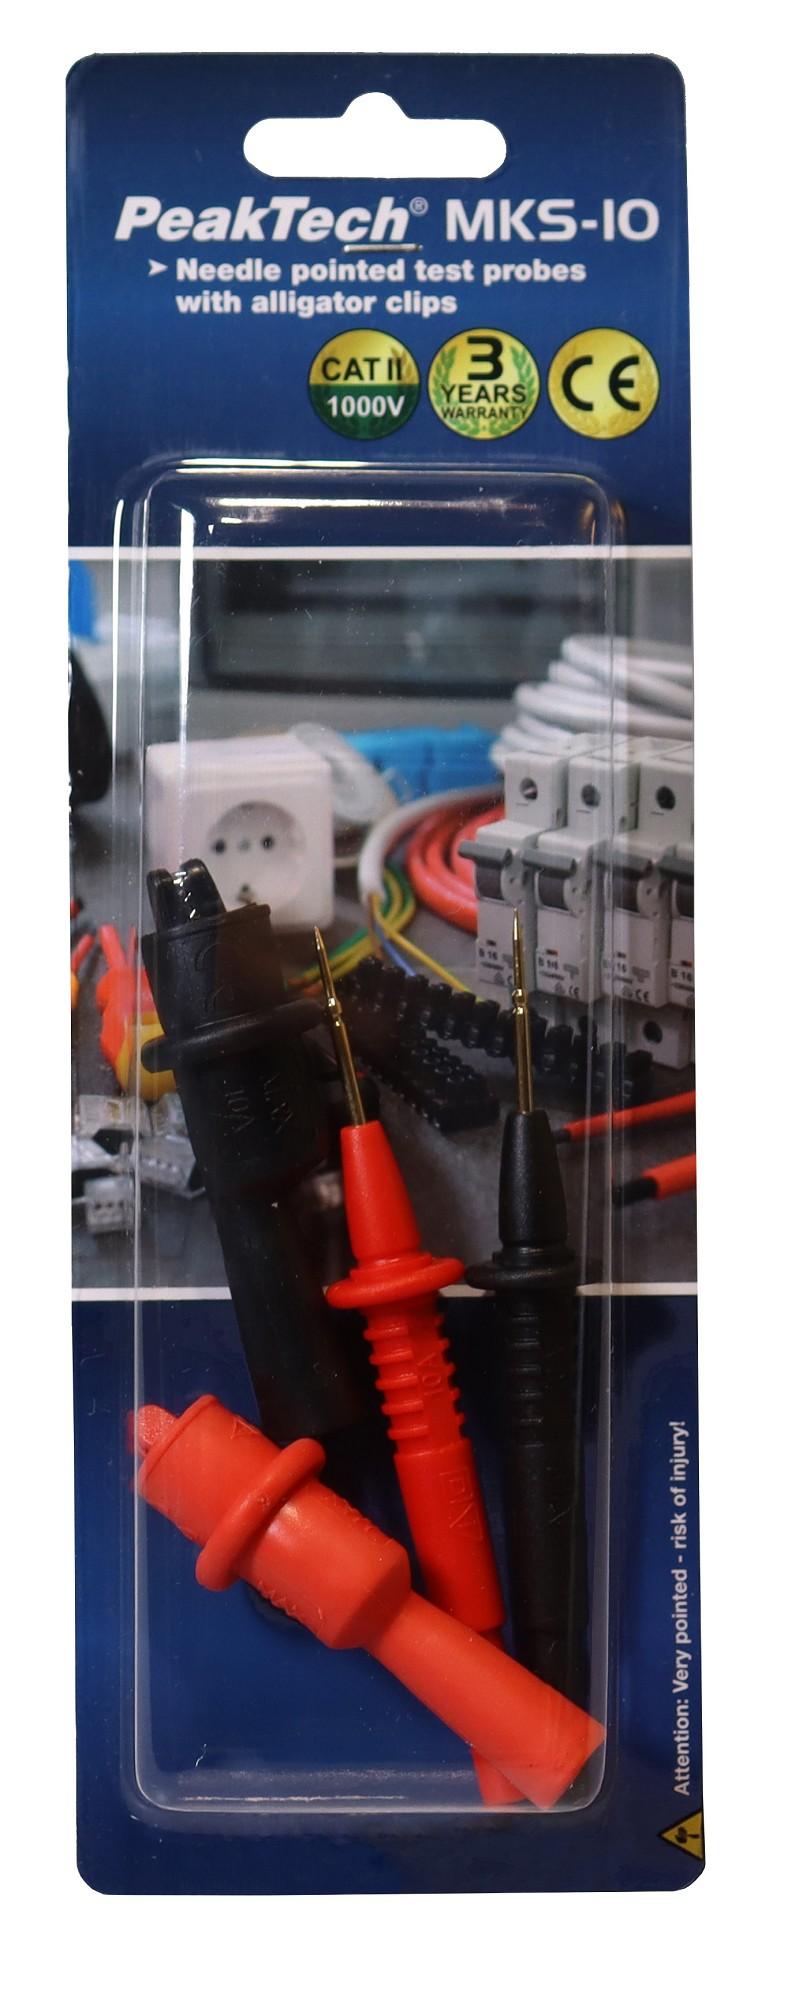 «PeakTech® MKS-10» Measuring tip set with 1 mm test tips